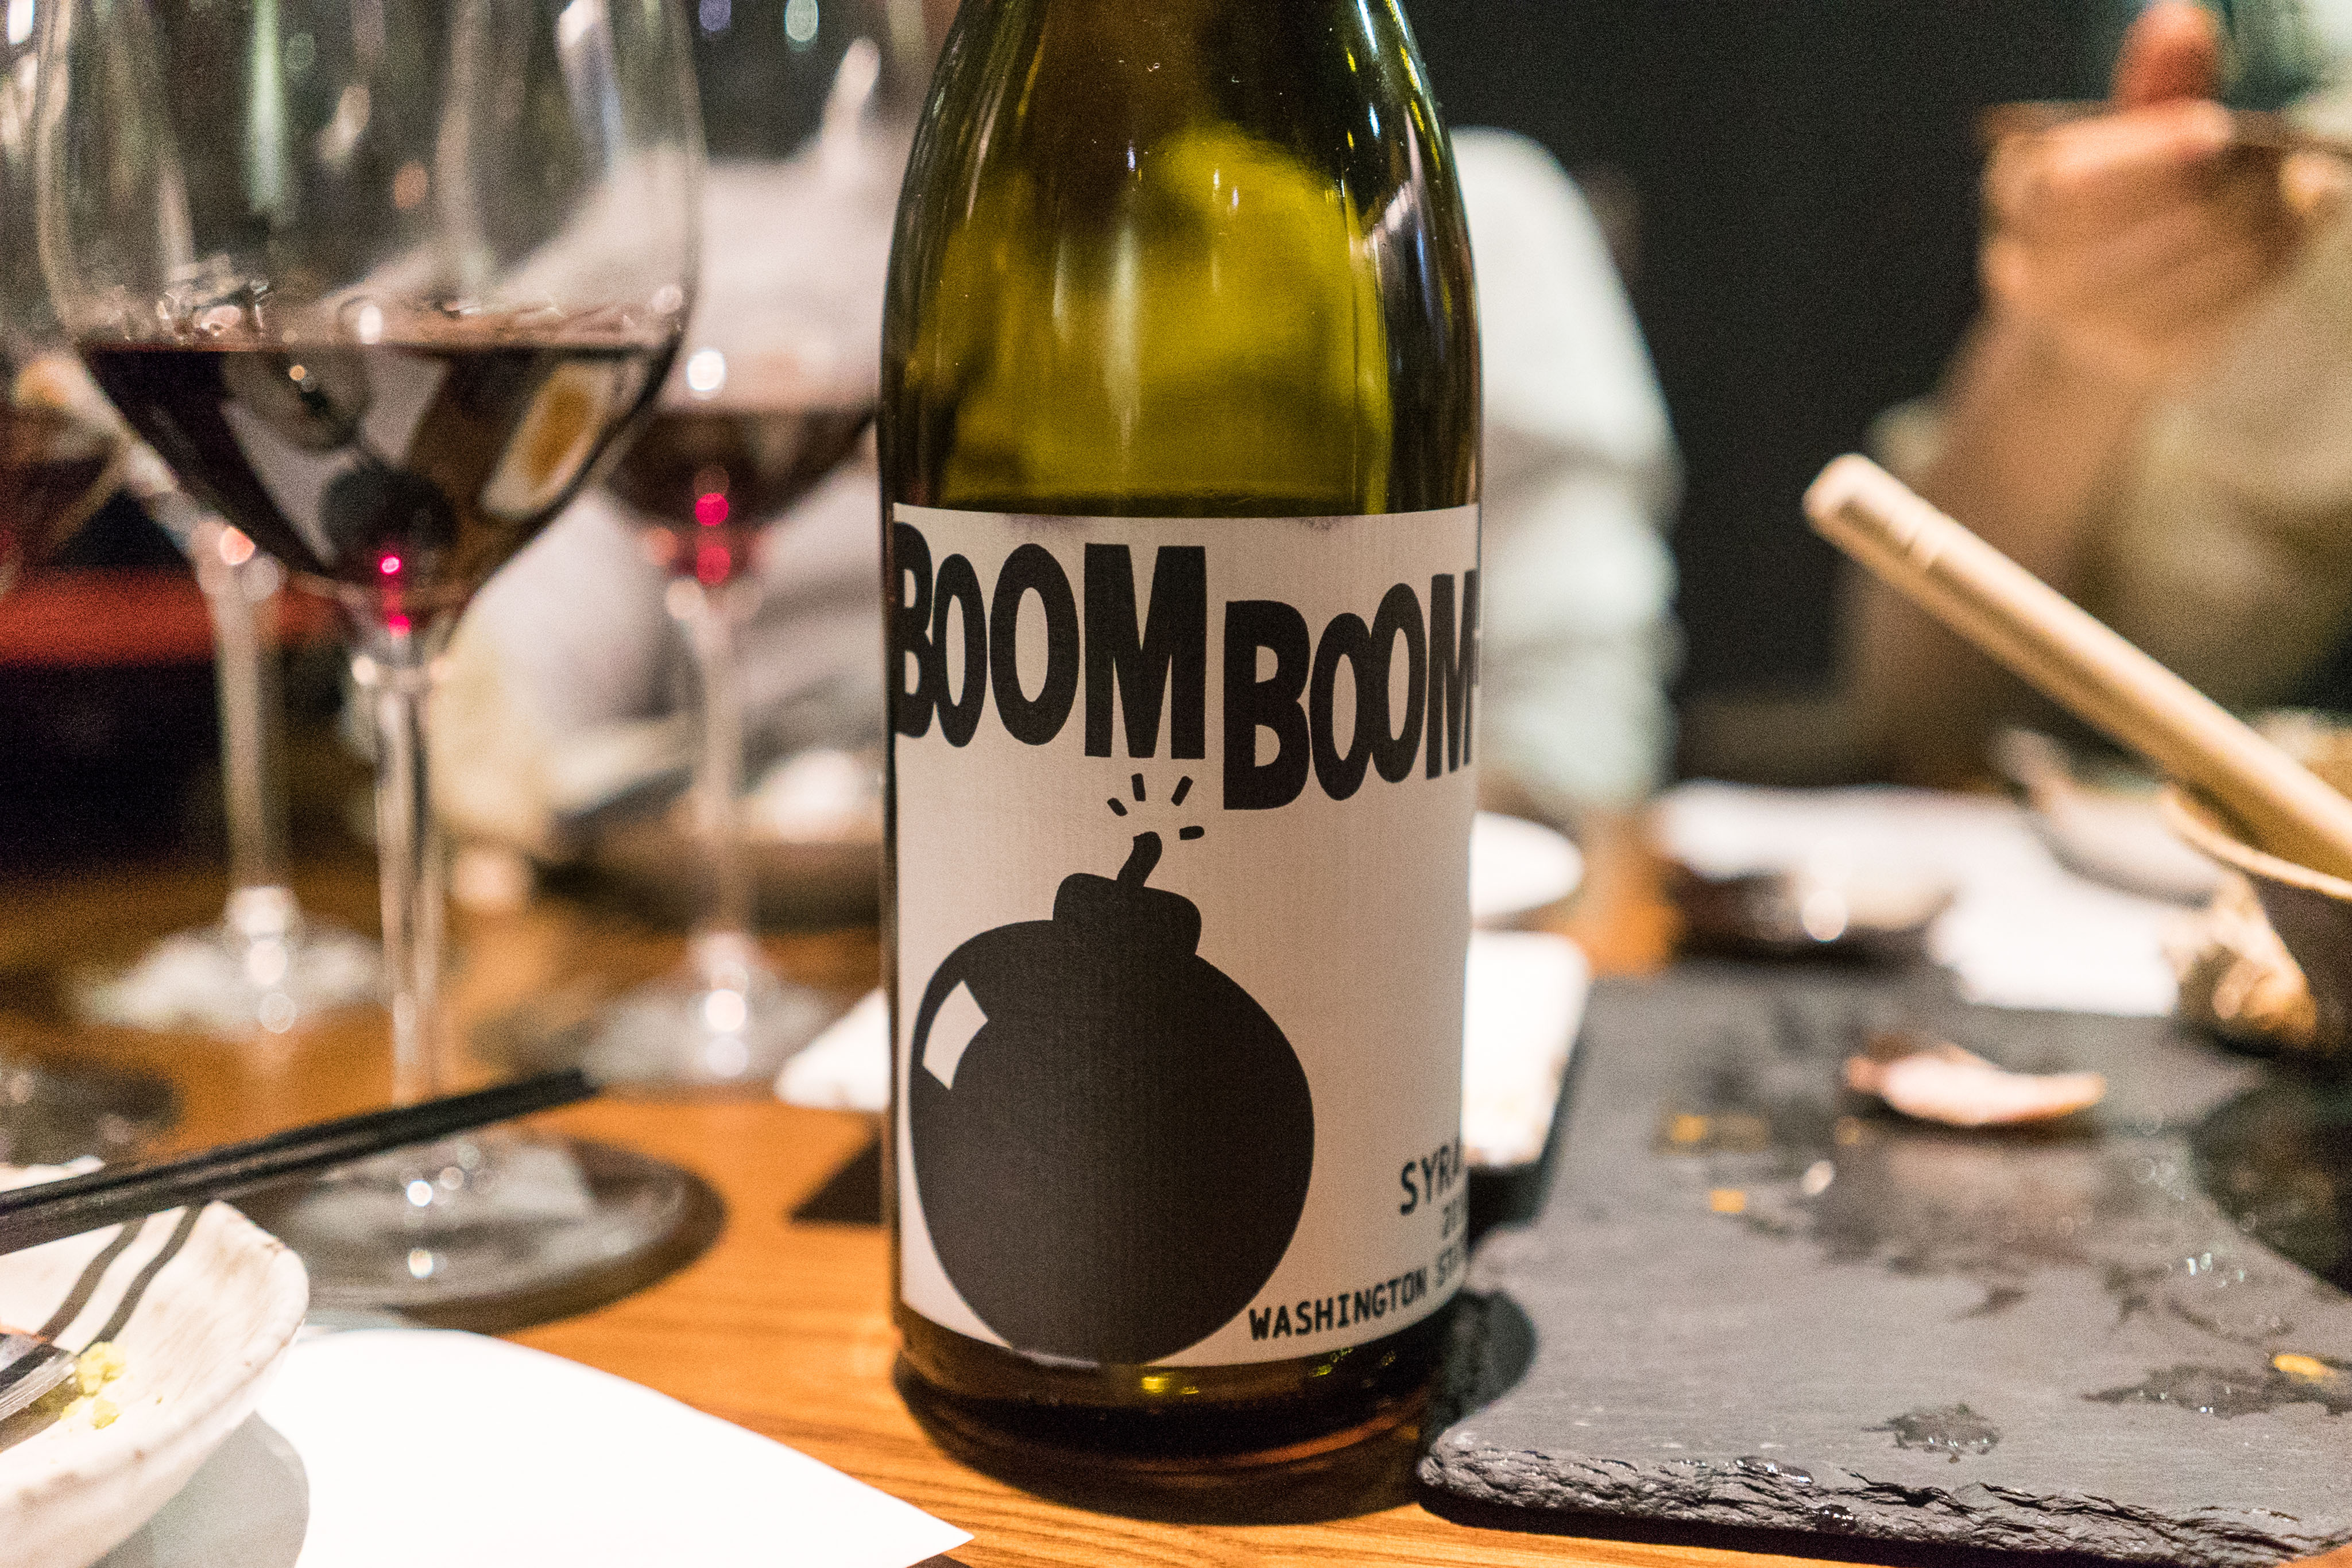 Charles Smith Wines Boom Boom Syrah